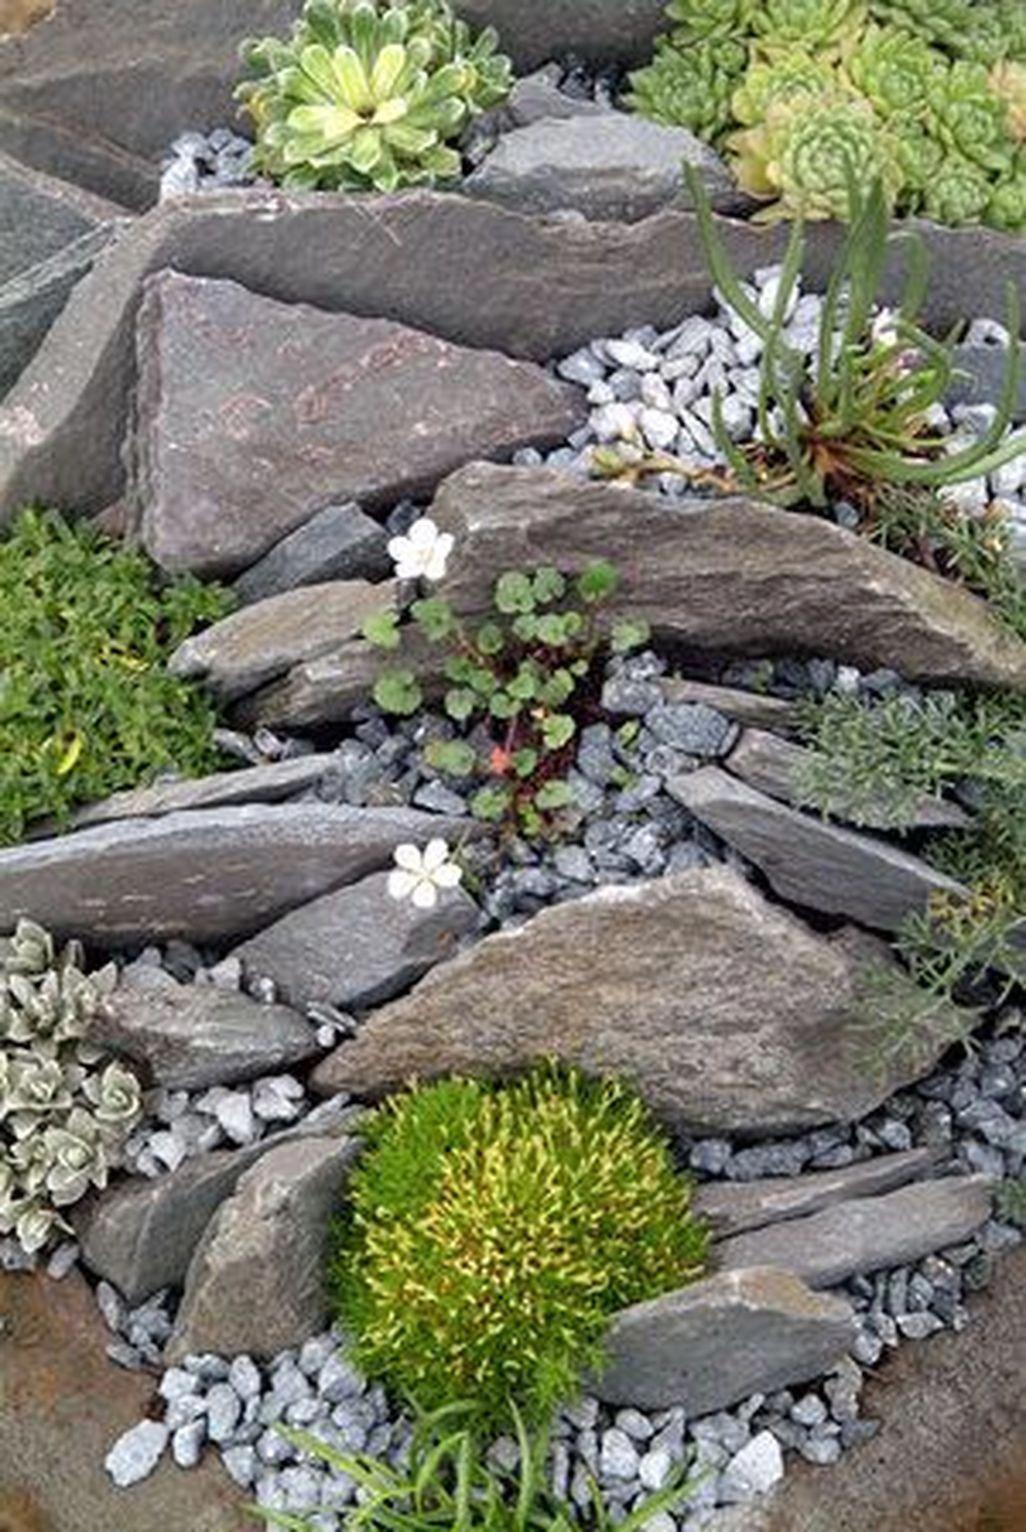 Patio Furniture Sets Lawn And Garden Diy Patio Furniture Outdoor Garden Wedding Rockery Garden Rock Garden Landscaping Rock Garden Design